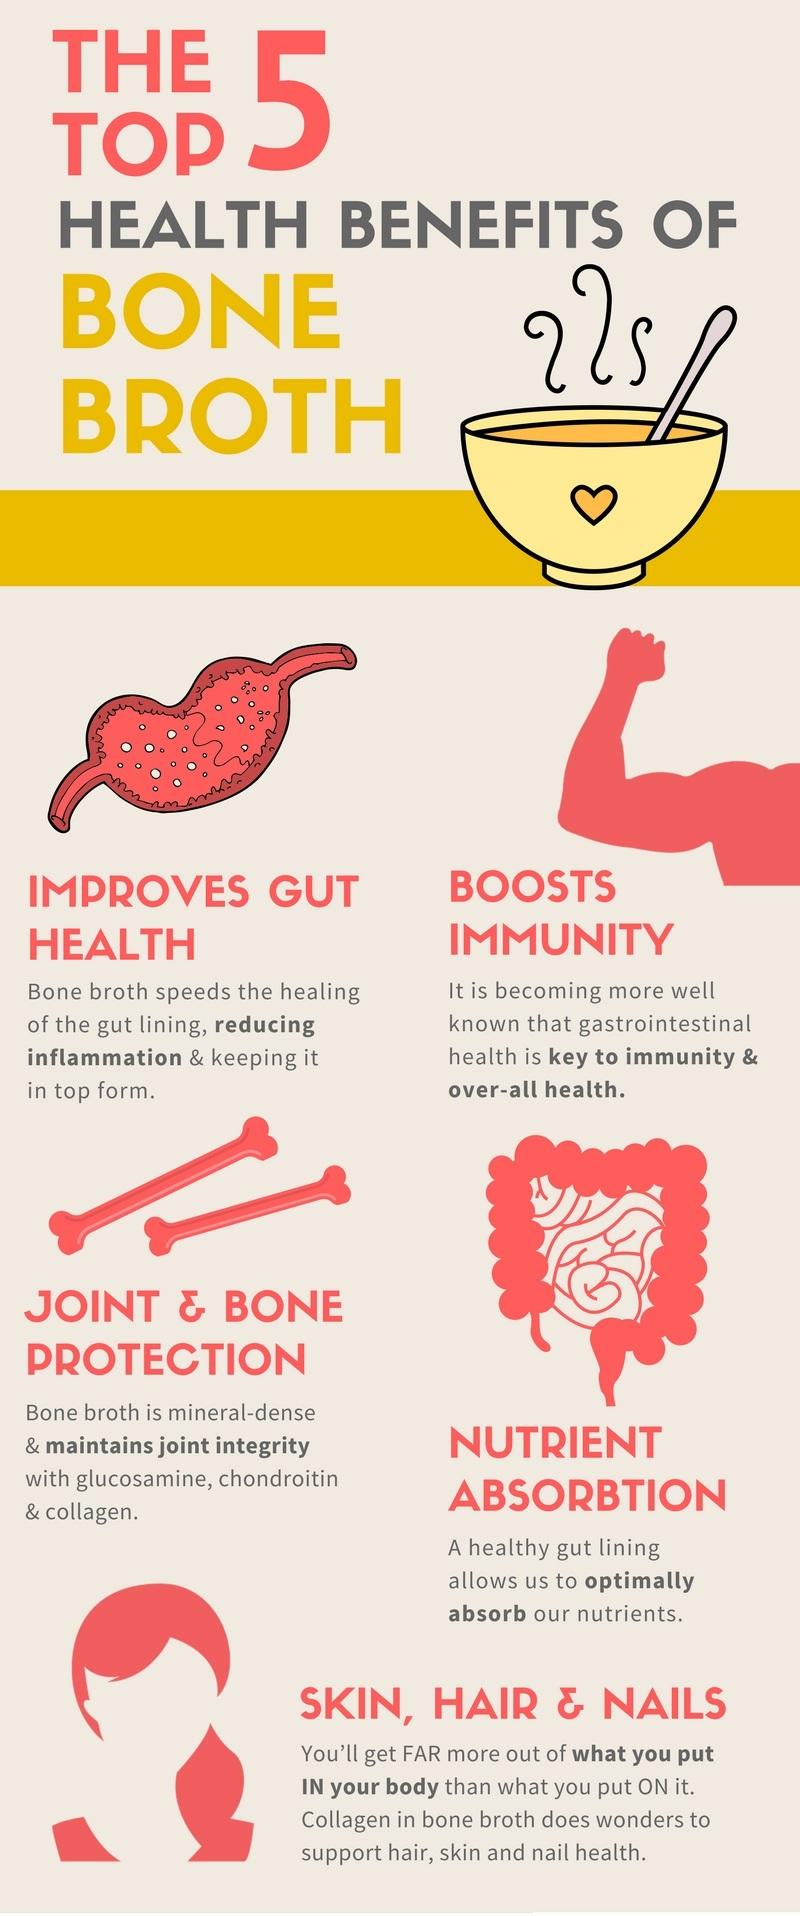 Health-Benefits-of-Bone-Broth-1.jpg